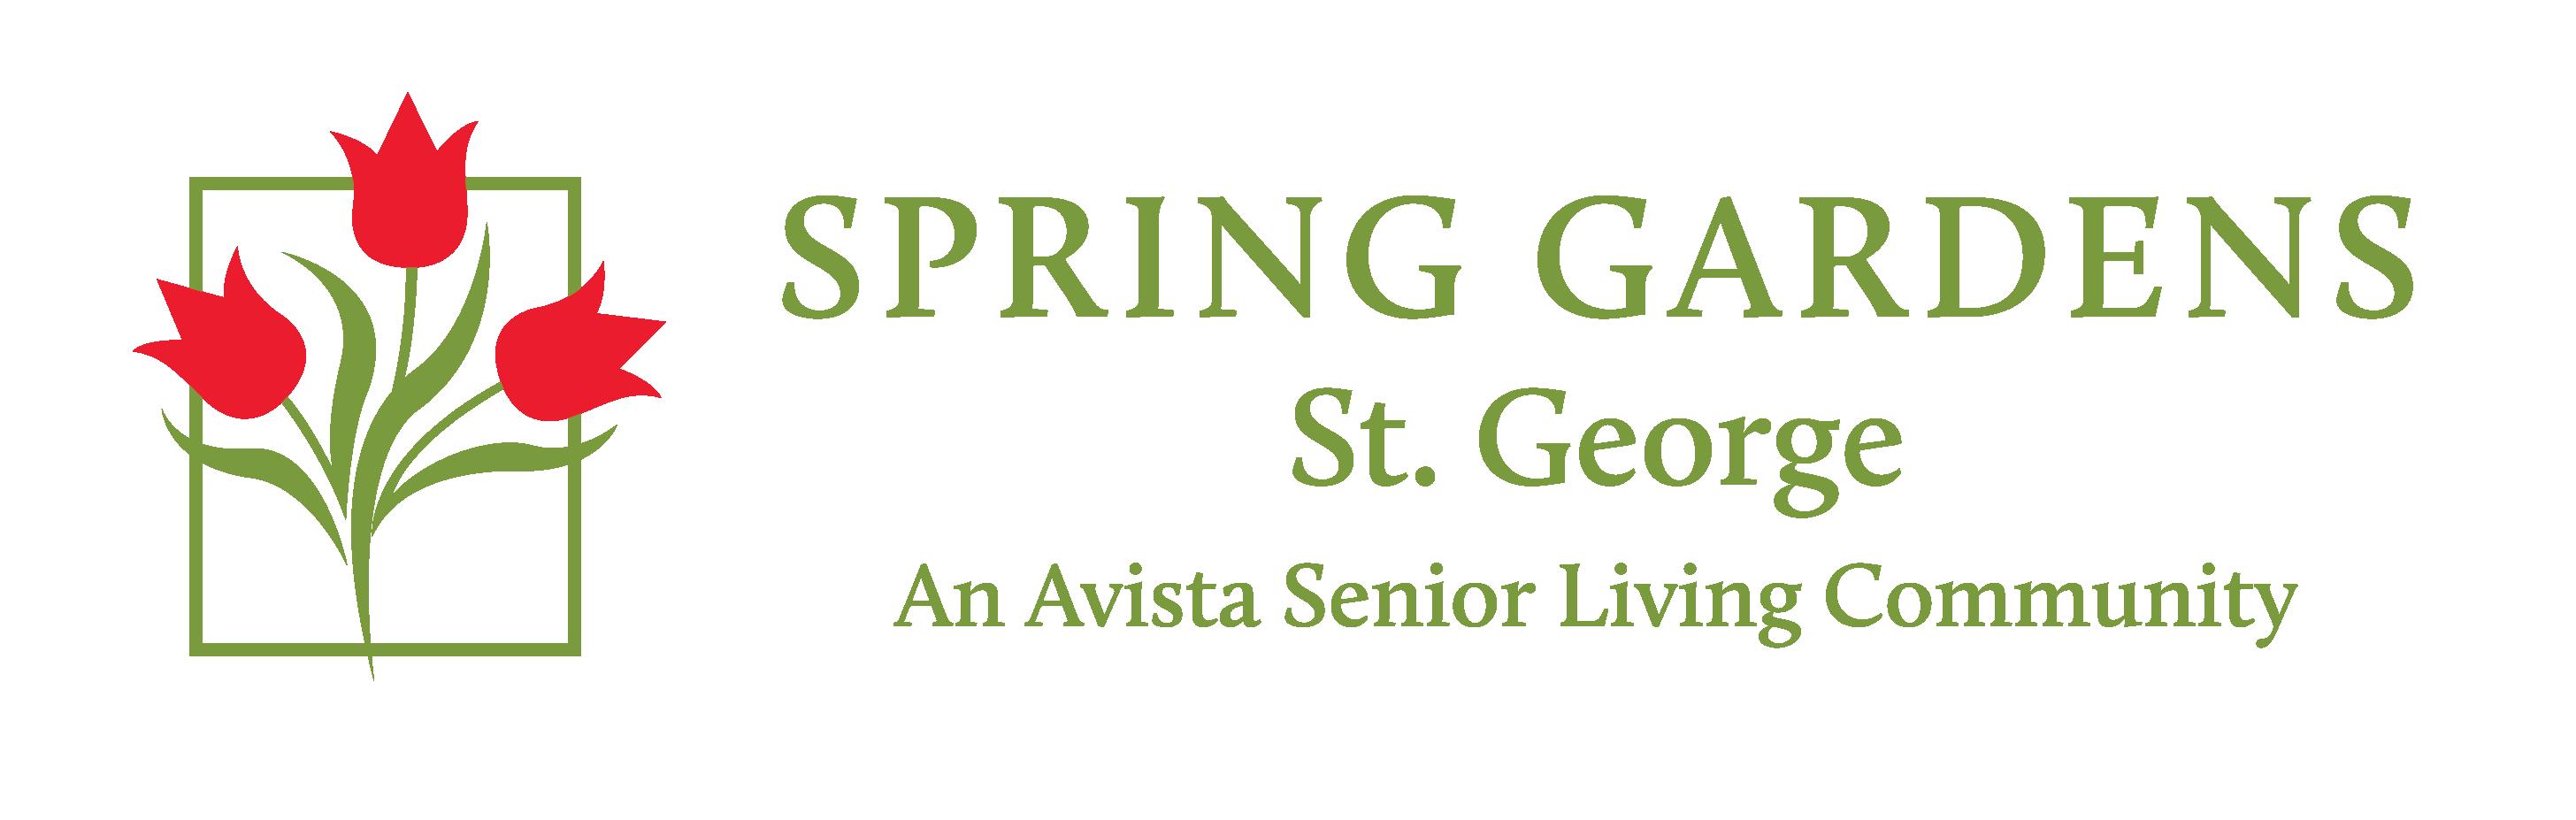 Spring Gardens St. George